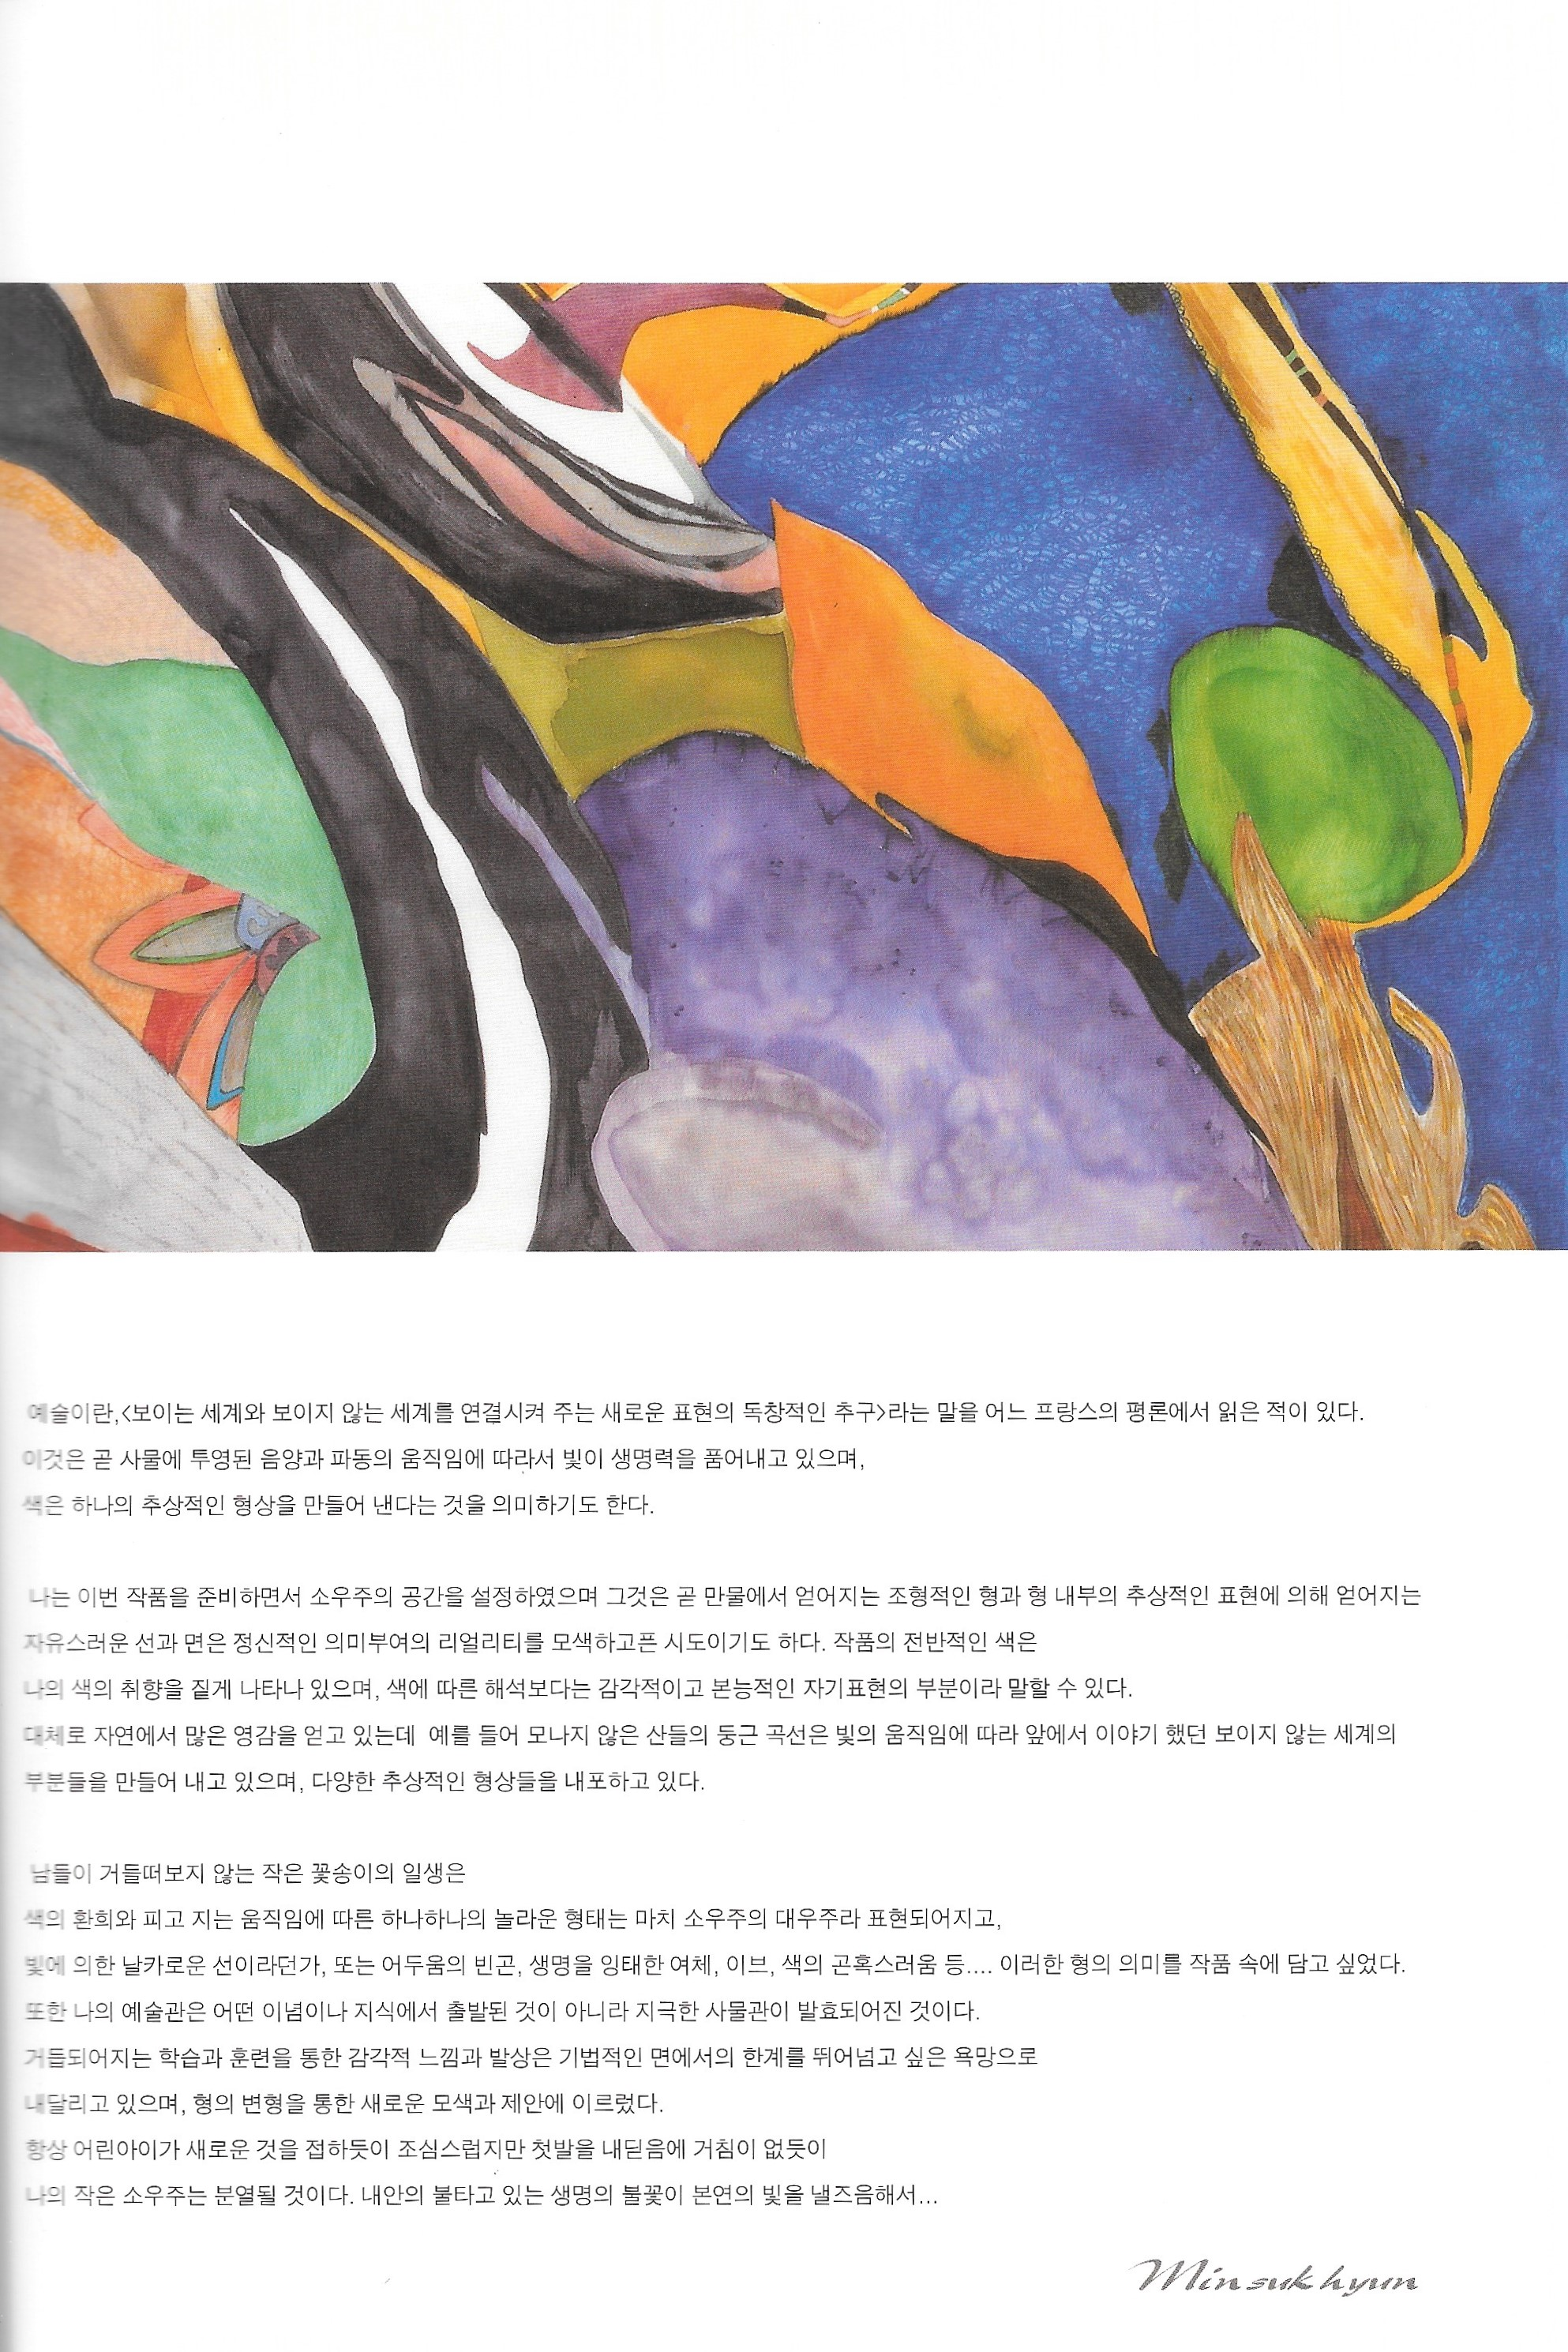 2004 Gail Musenm Min sukhyun invitaional Exhibition.1